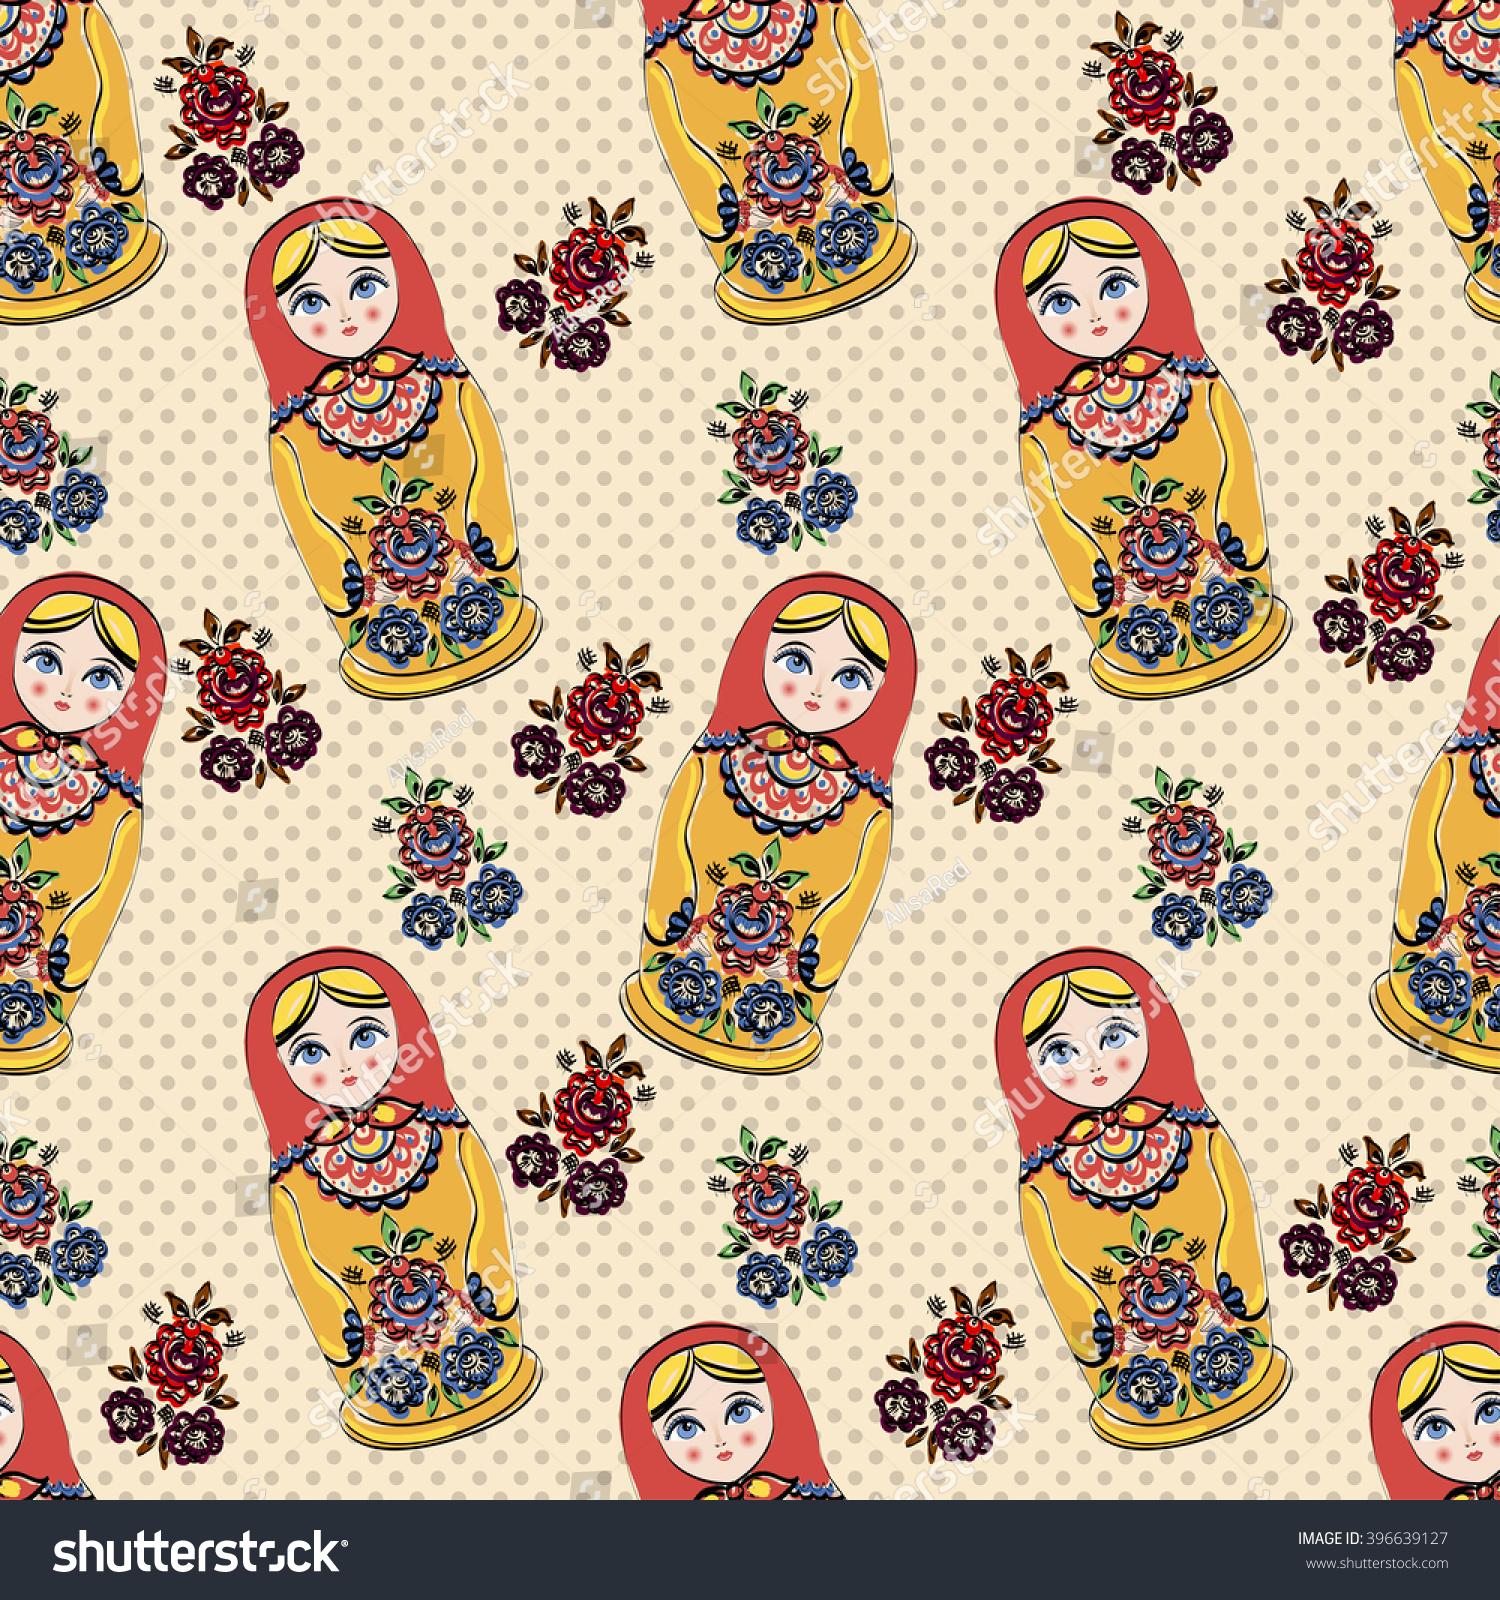 seamless classic folklore pattern russian dolls stock illustration